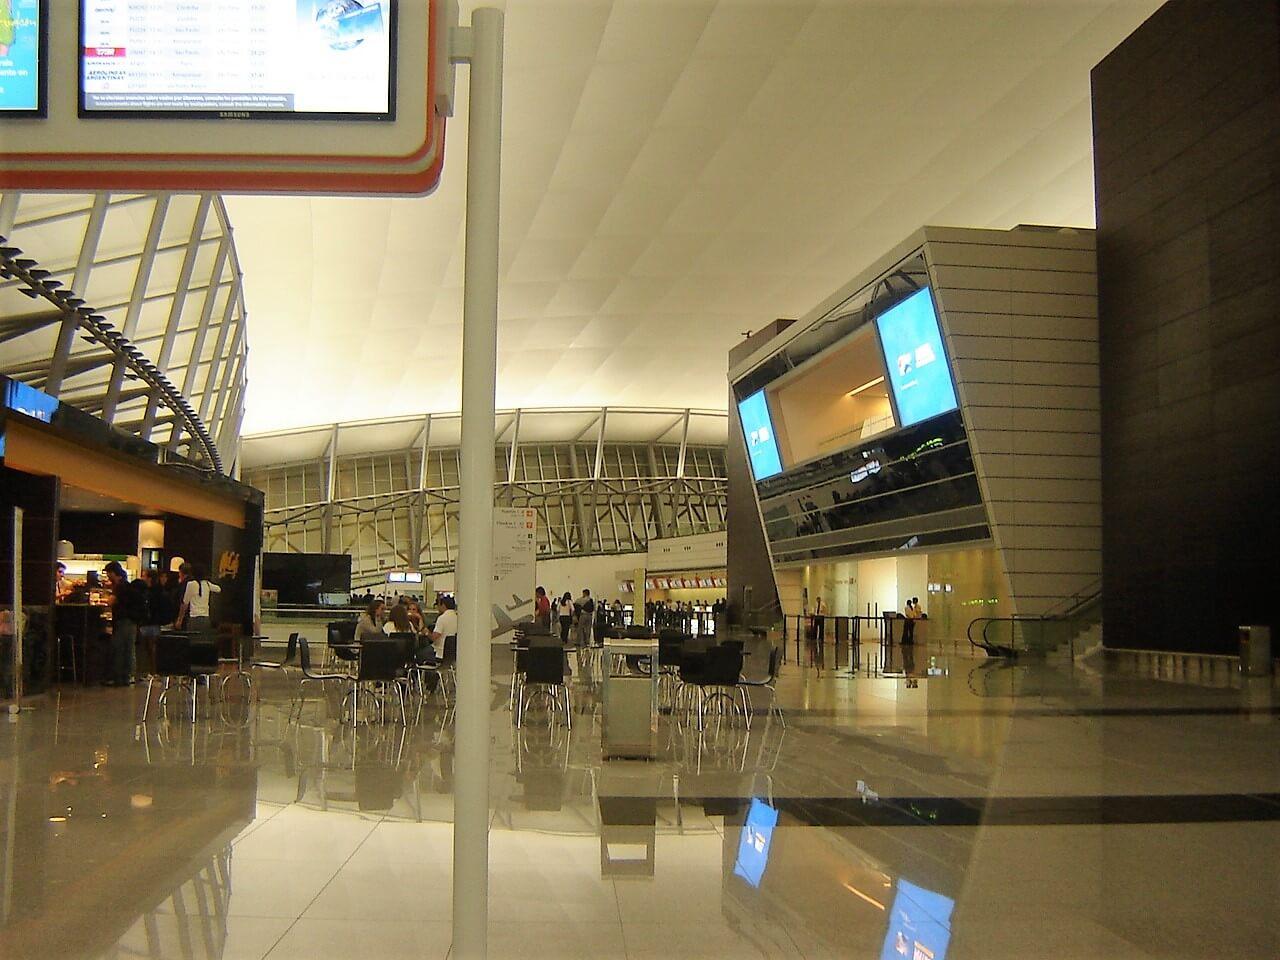 Aeroporto Carrasco